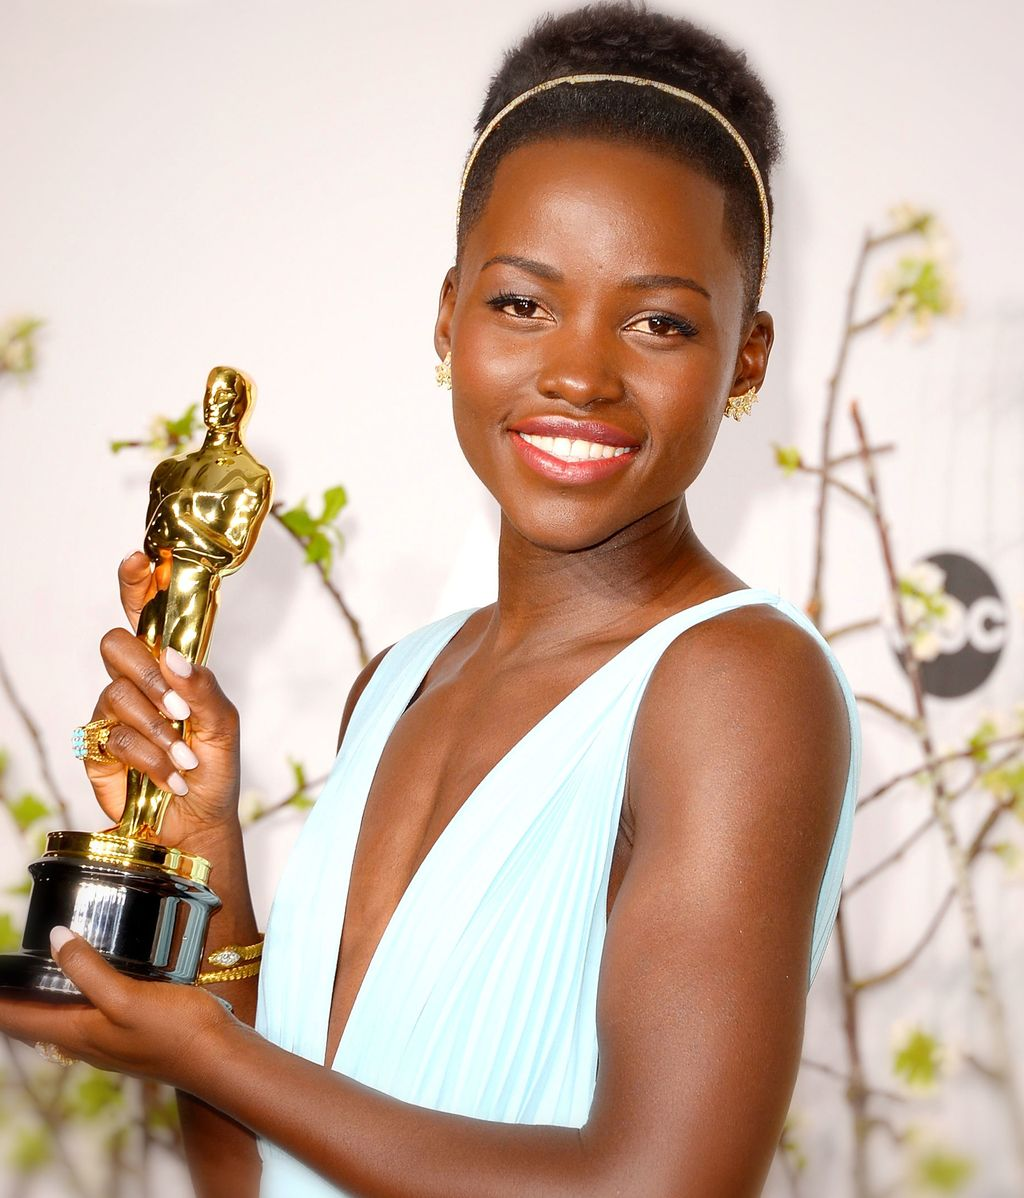 Las claves de estilo de Lupita Nyong'o